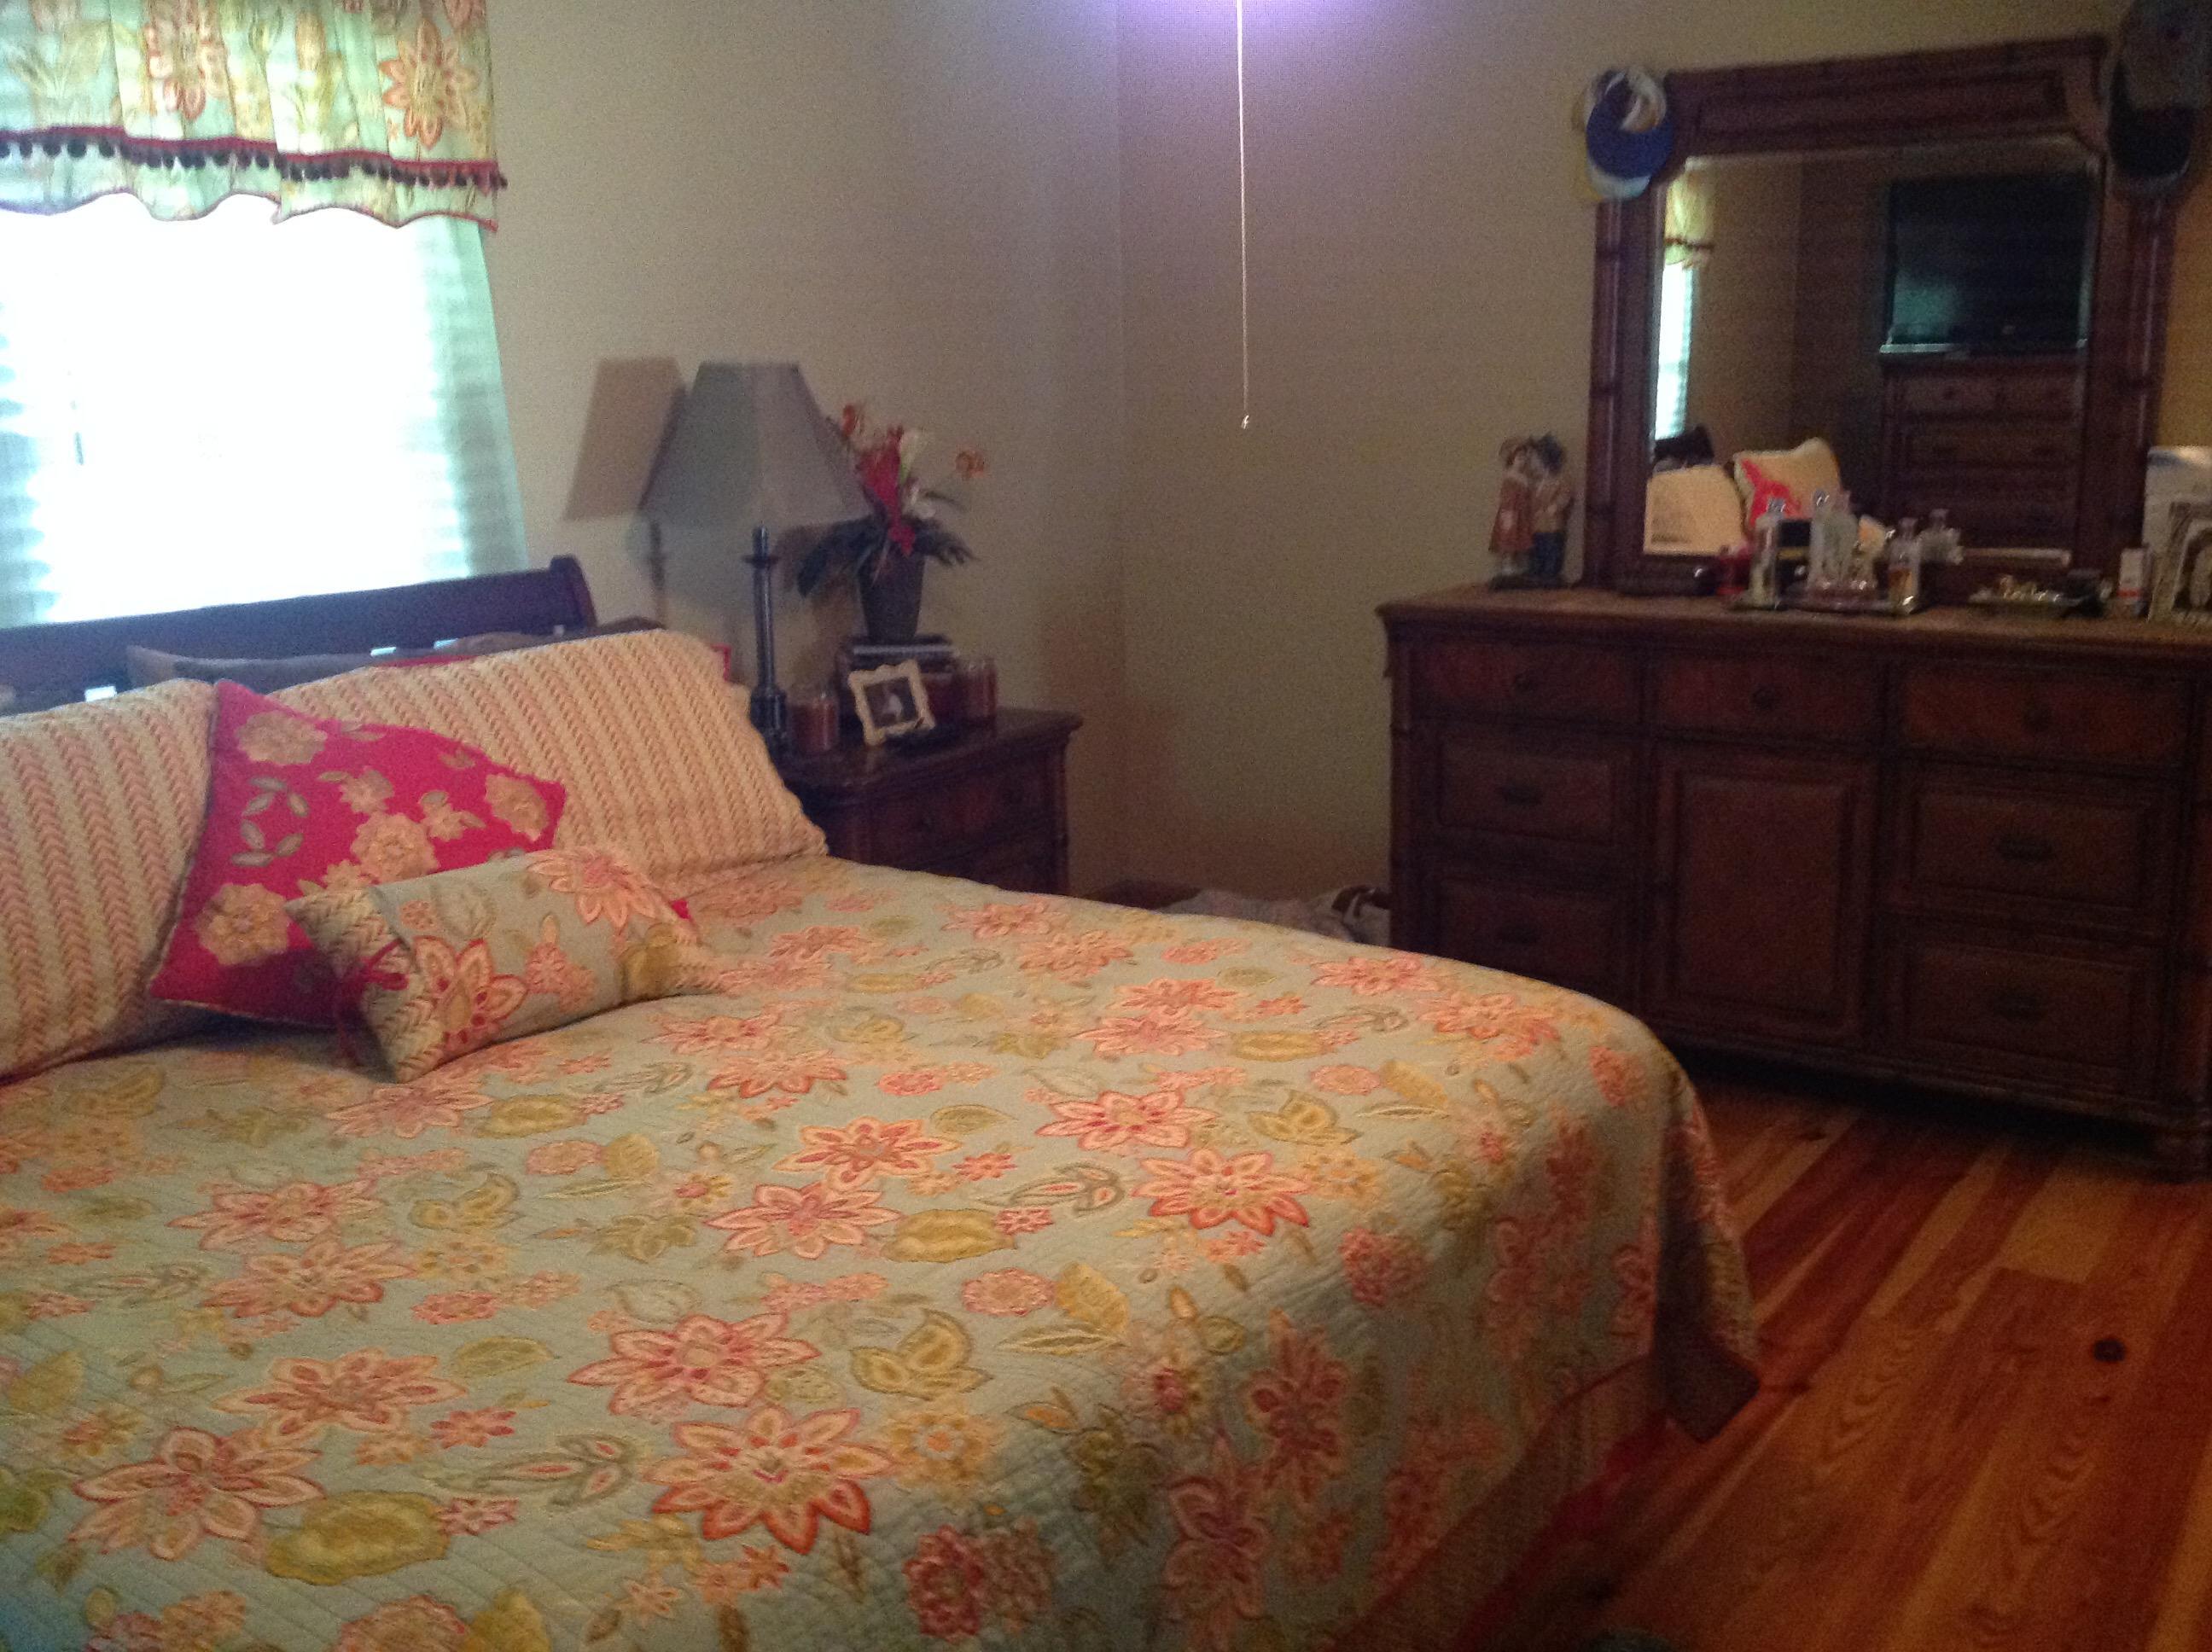 Belvedere II Homes For Sale - 122 Dogwood, Eutawville, SC - 22